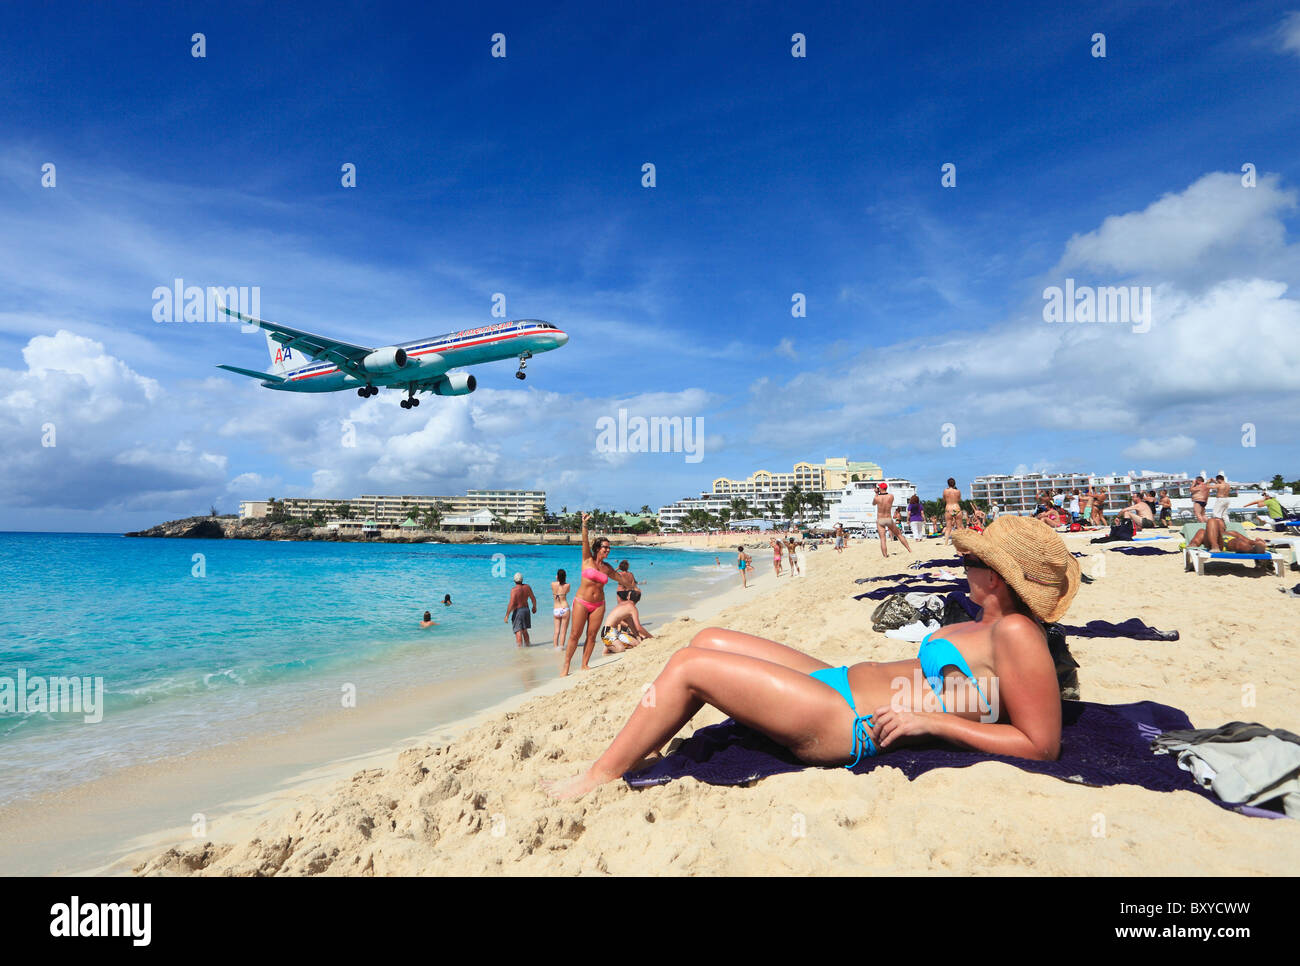 American Airlines Jet landing across the Maho beach at St.Maarten Princess Juliana Airport - Stock Image